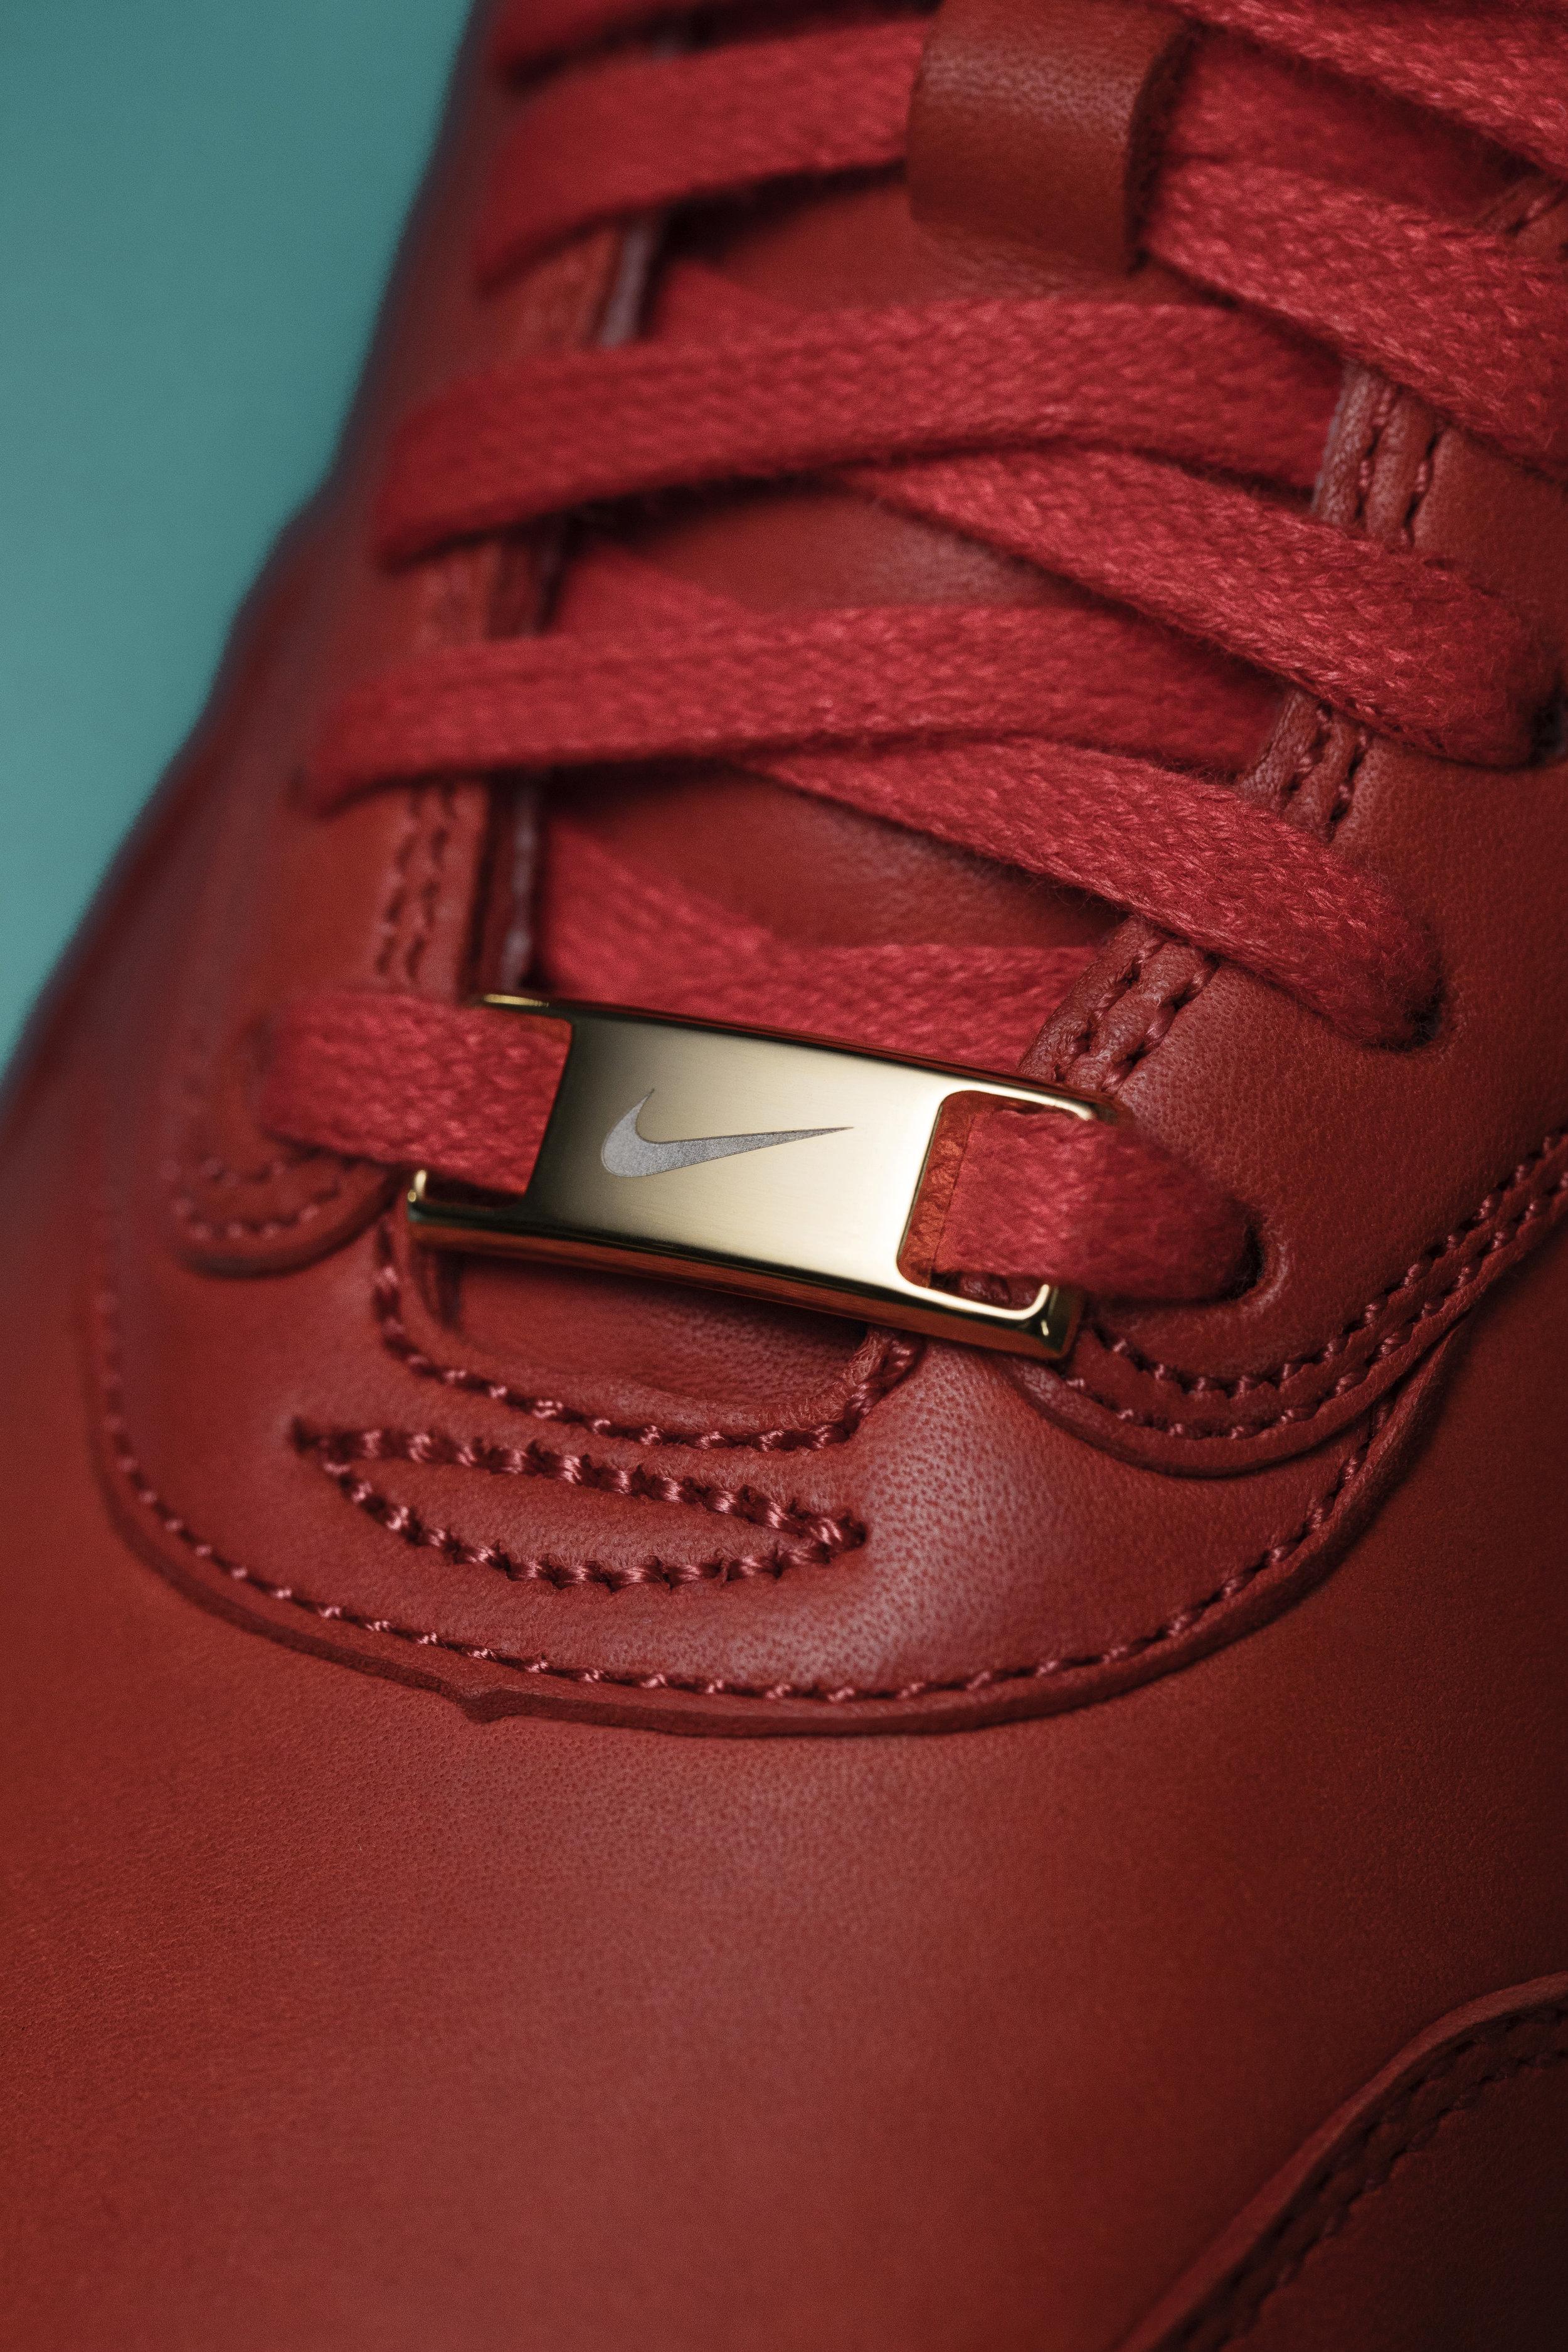 SP17_Nike_ID_AM1_Leather_Shoot_141.jpg